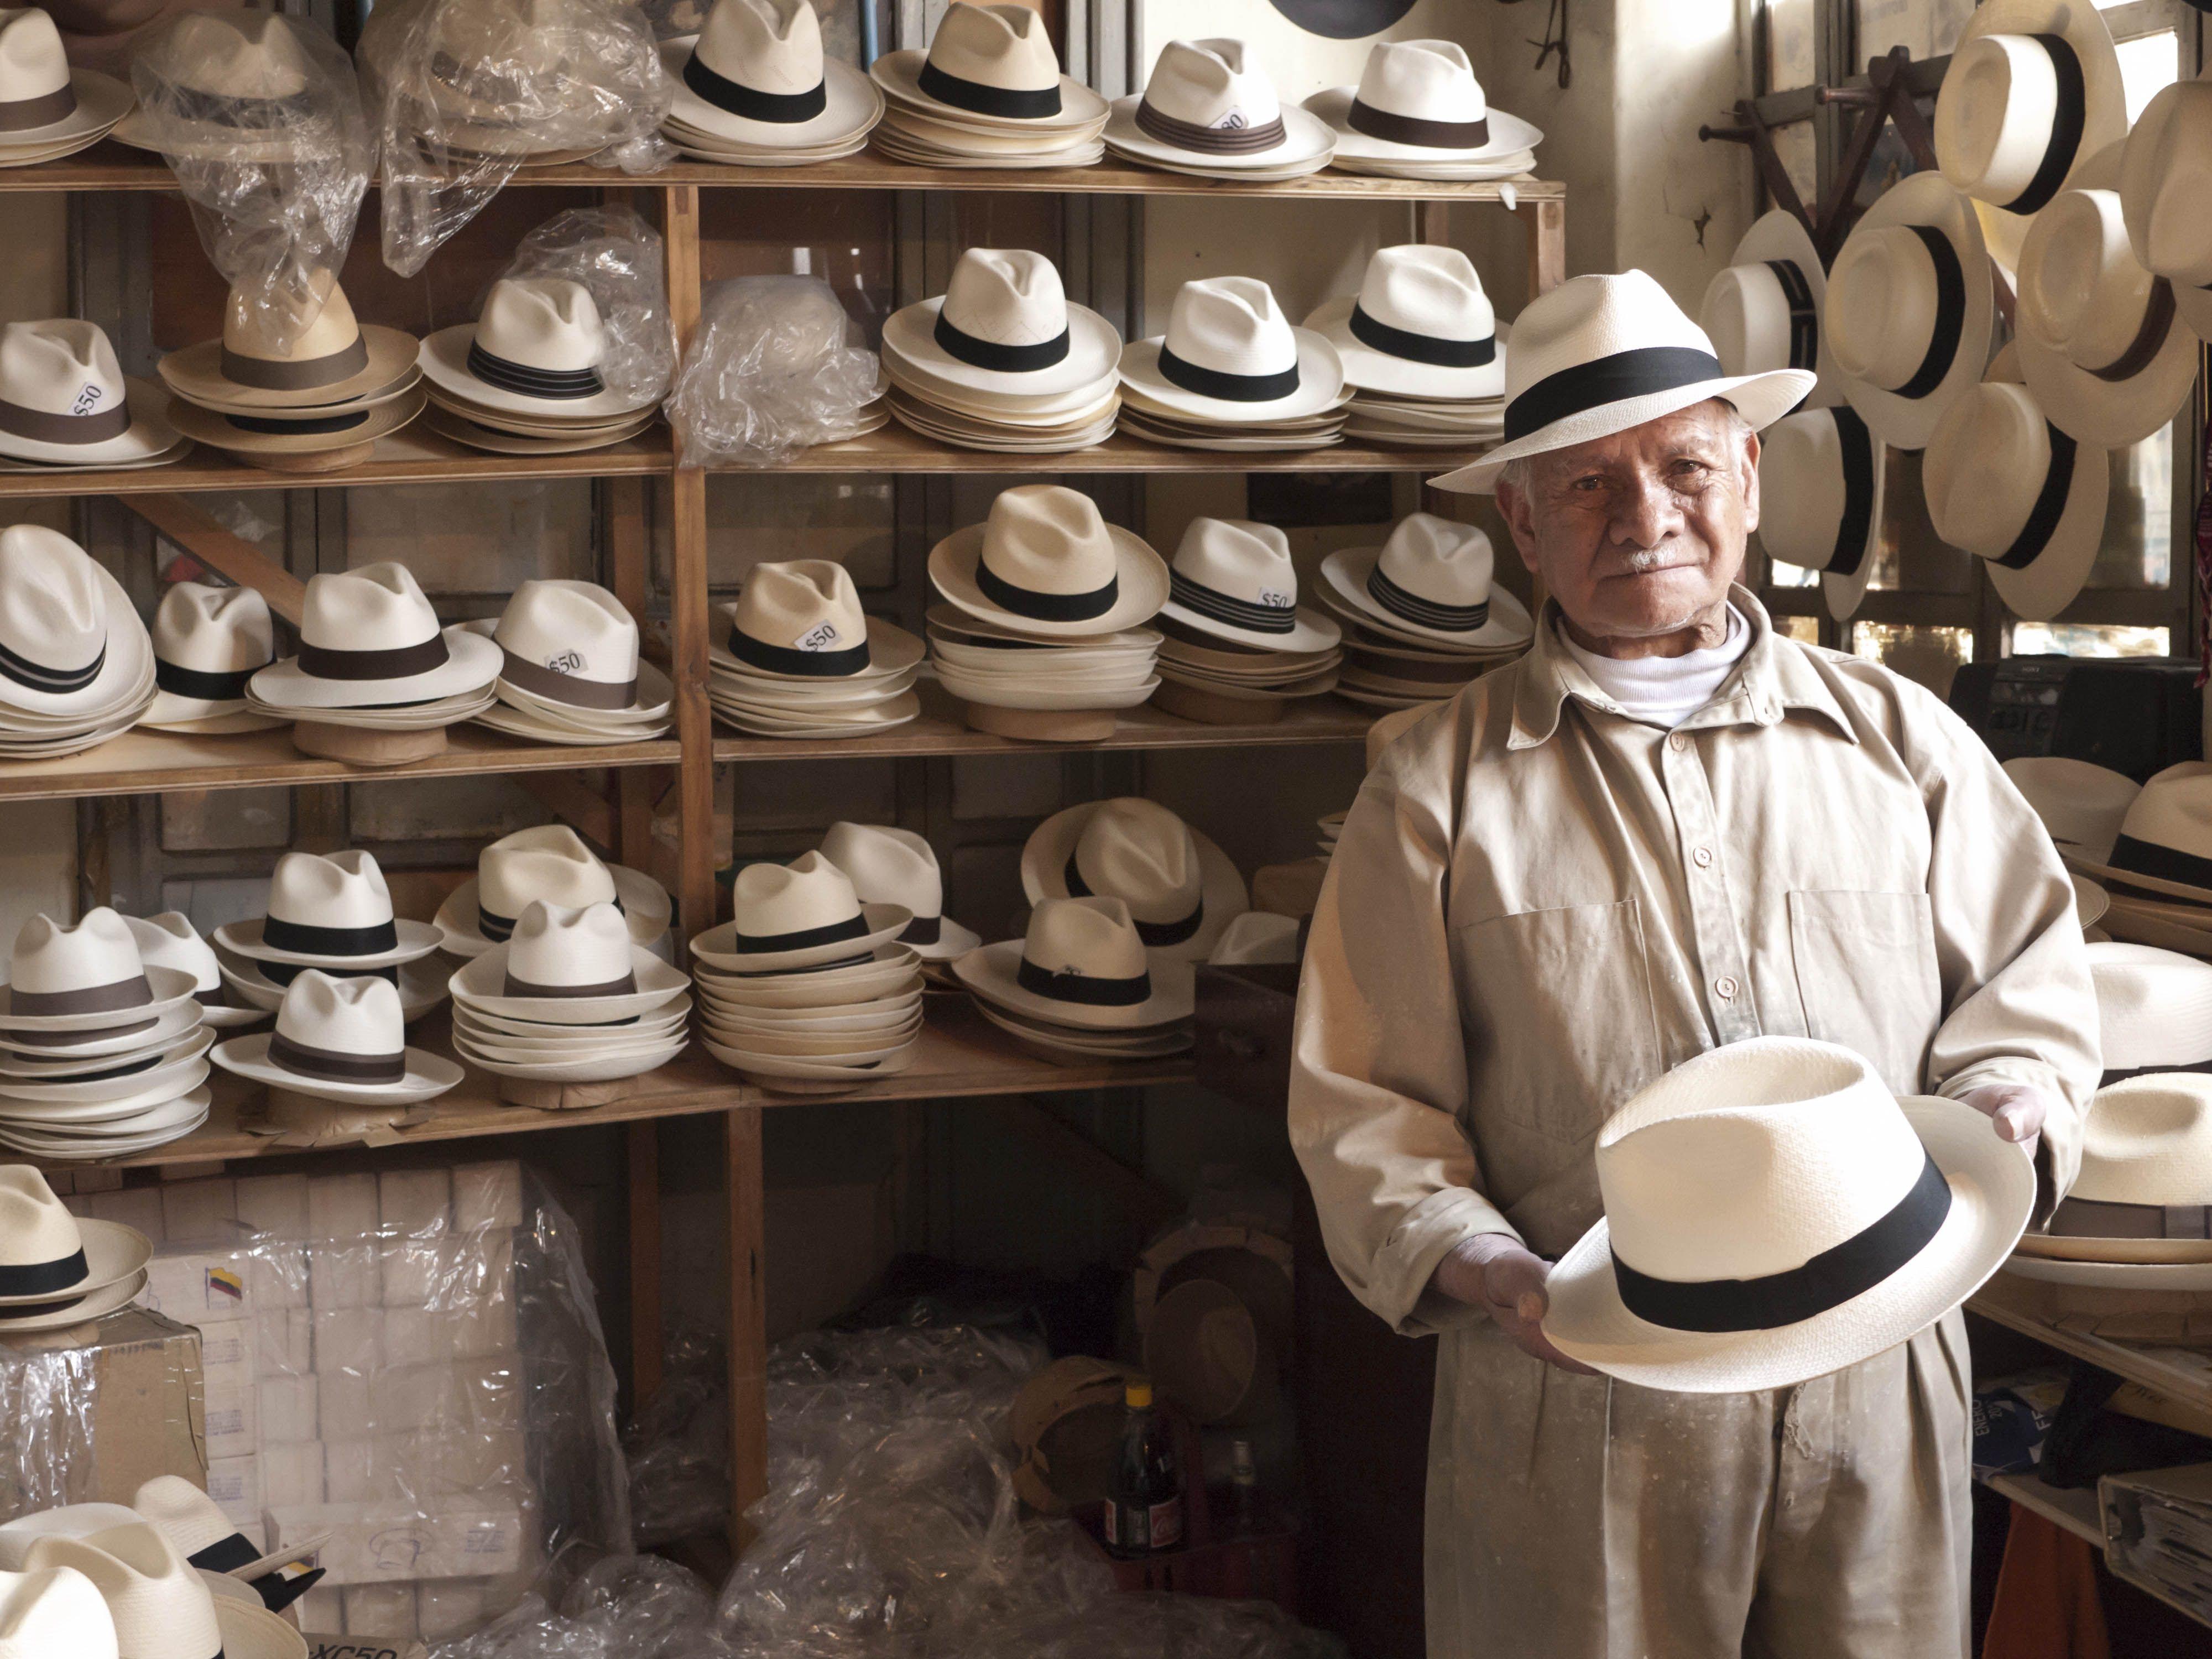 dc4a78414 The REAL panama hats are made in Ecuador!   Ecuador in 2019 ...